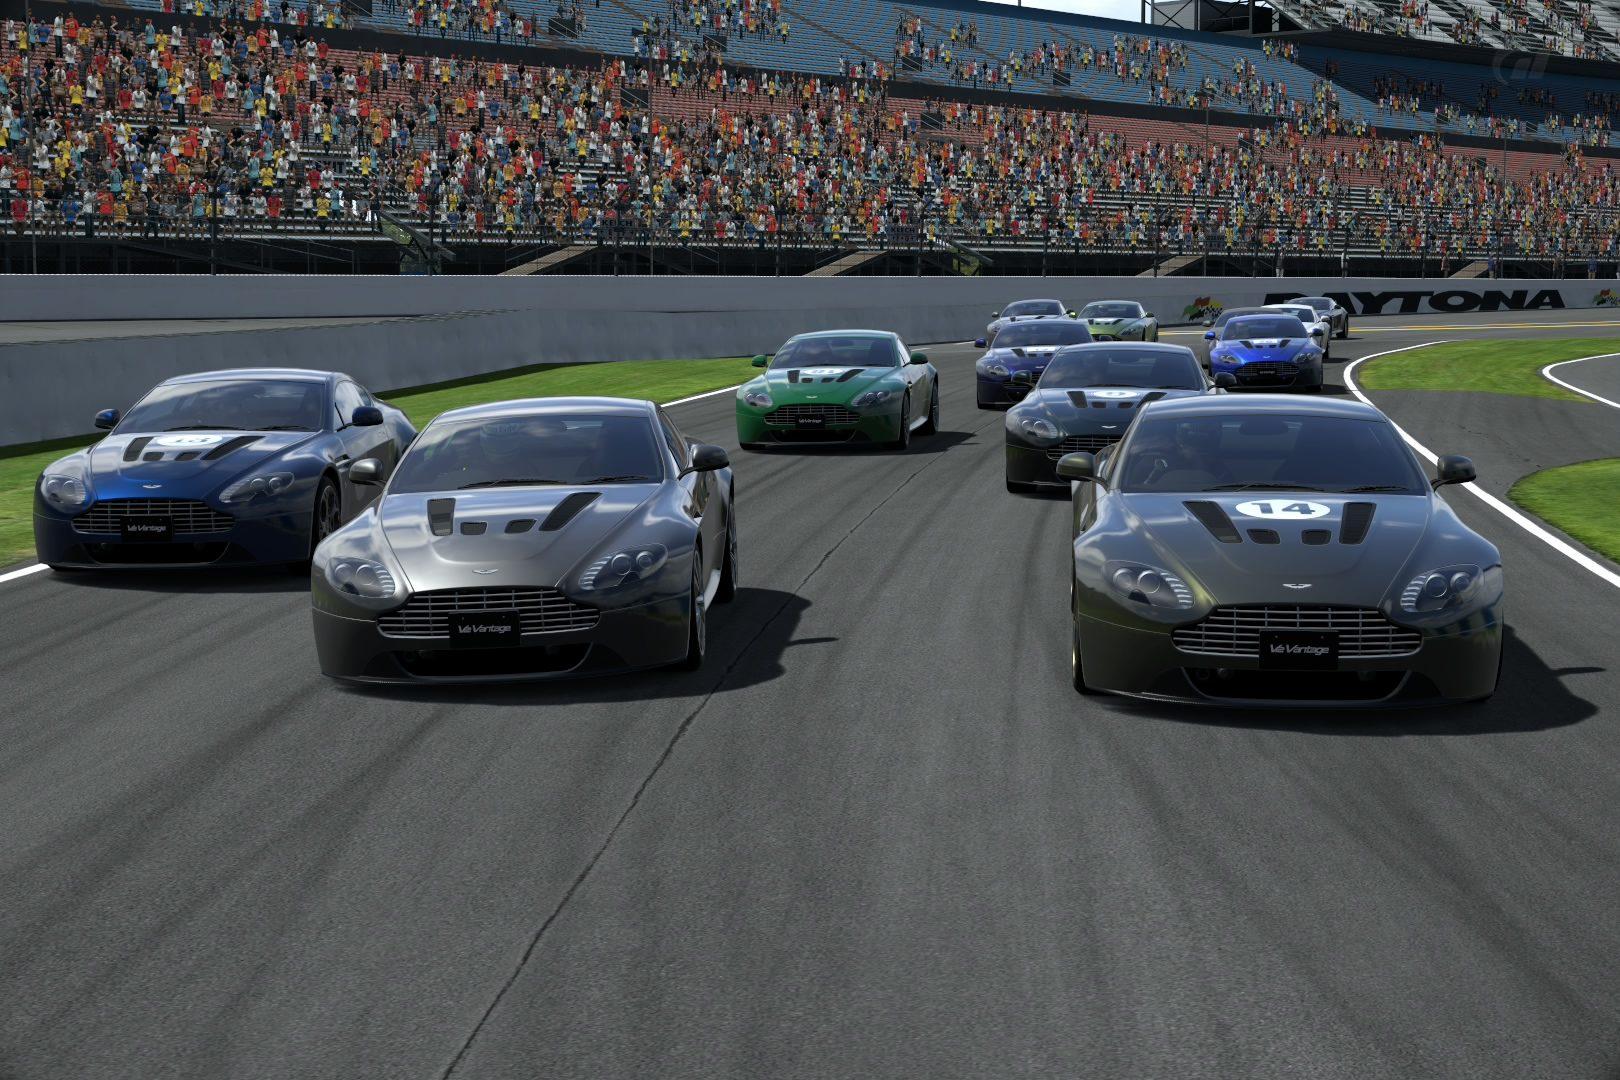 Daytona Road Course_12.jpg